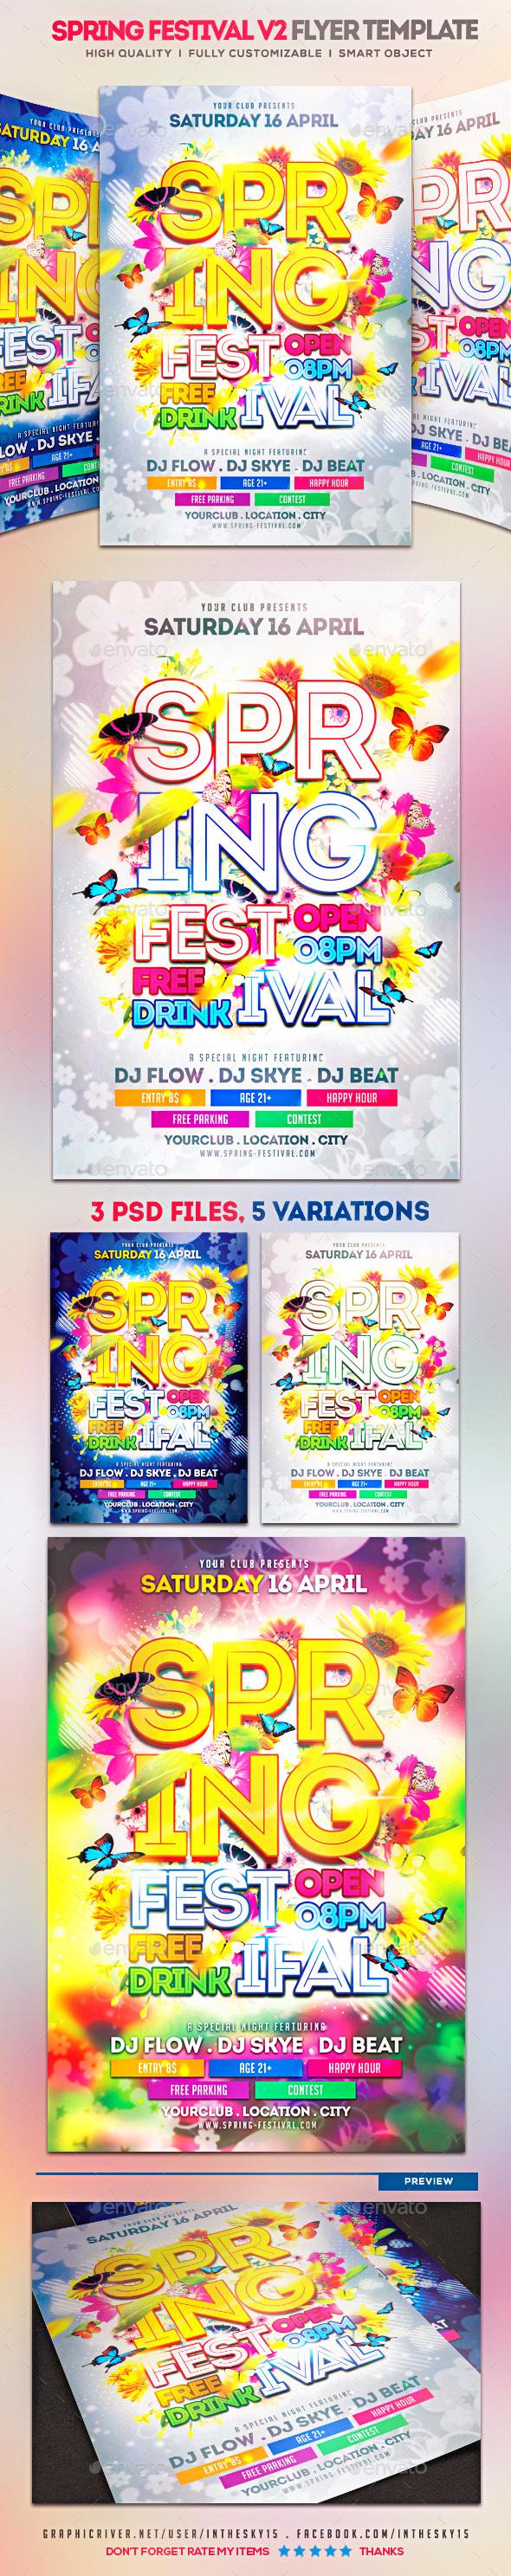 Spring Festival V2 Flyer Template - Events Flyers